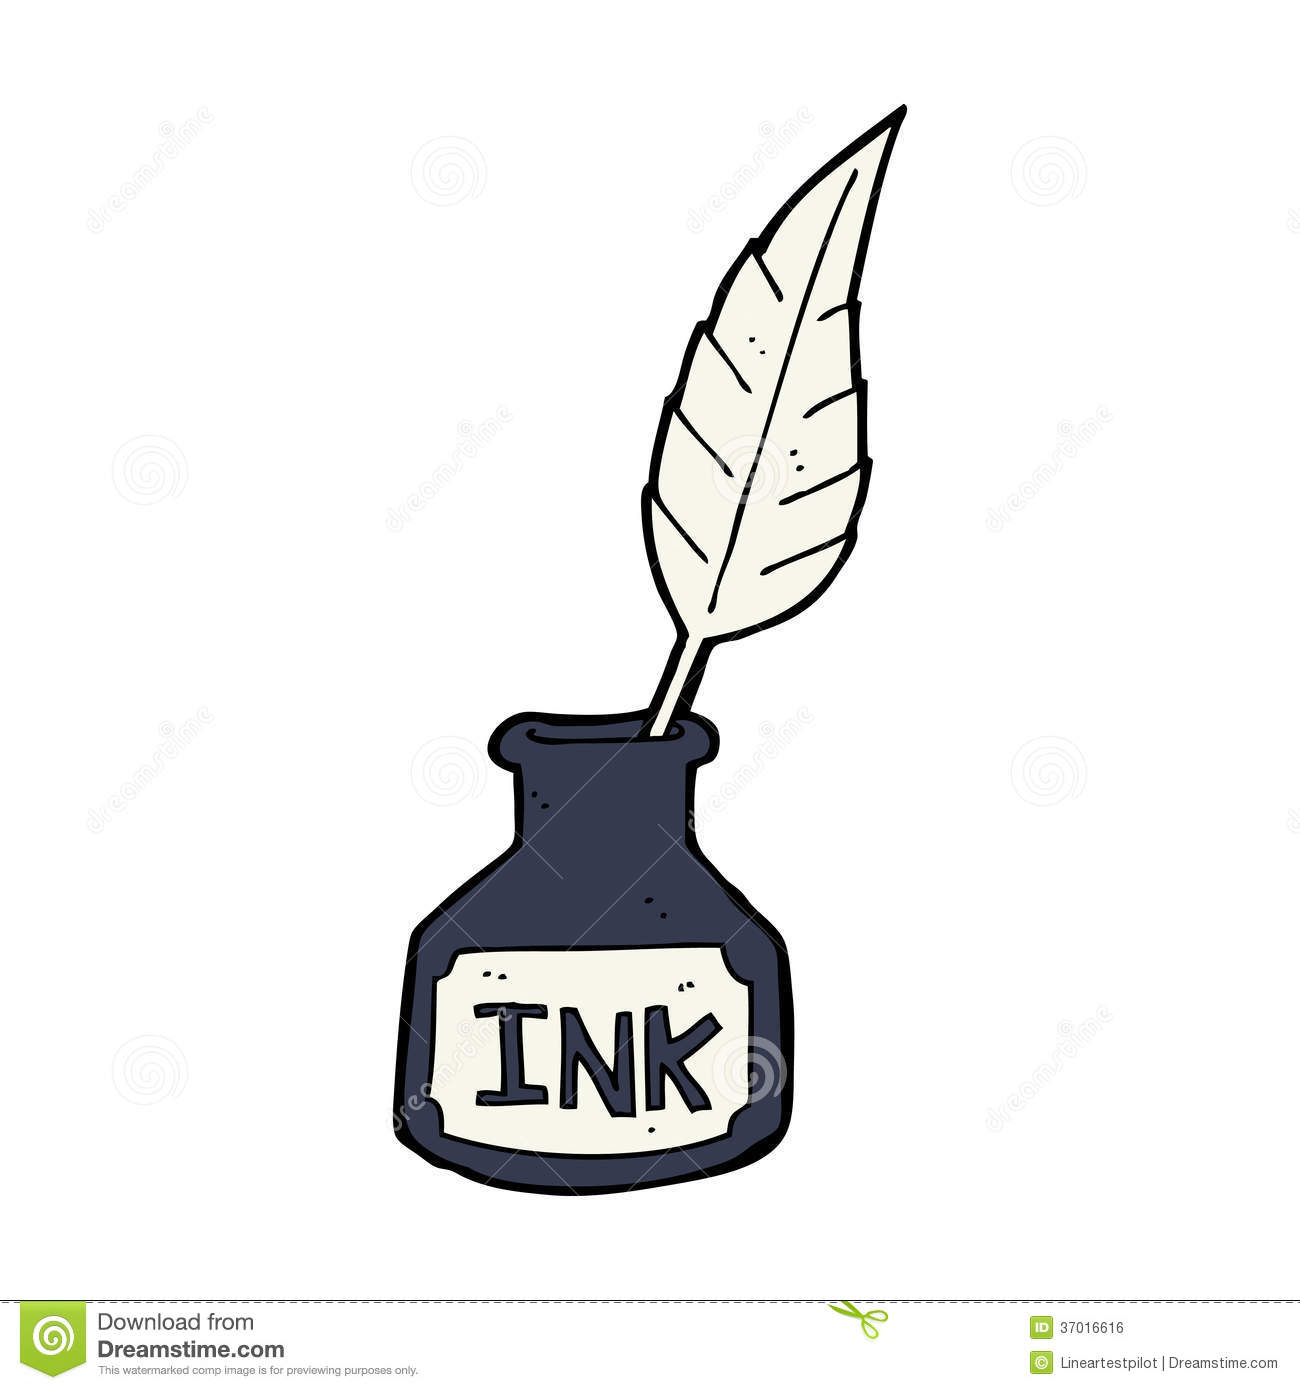 Ink Clipart Cartoon Ink Bottle Royalty-Ink Clipart Cartoon Ink Bottle Royalty-4